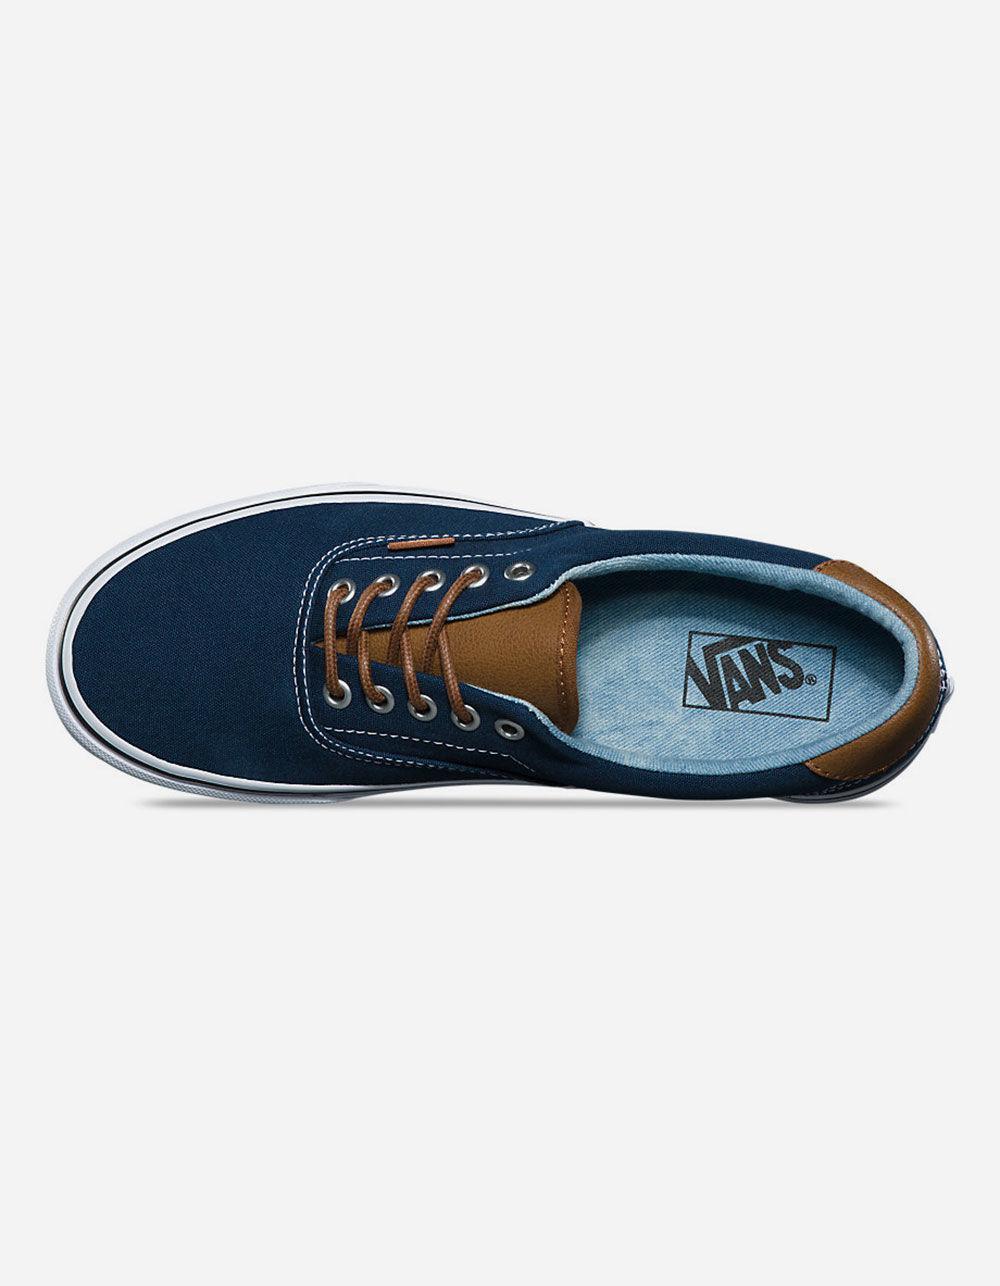 78d2dcd4a70 Lyst - Vans C l Era 59 Dress Blues   Acid Denim Shoes in Blue for Men